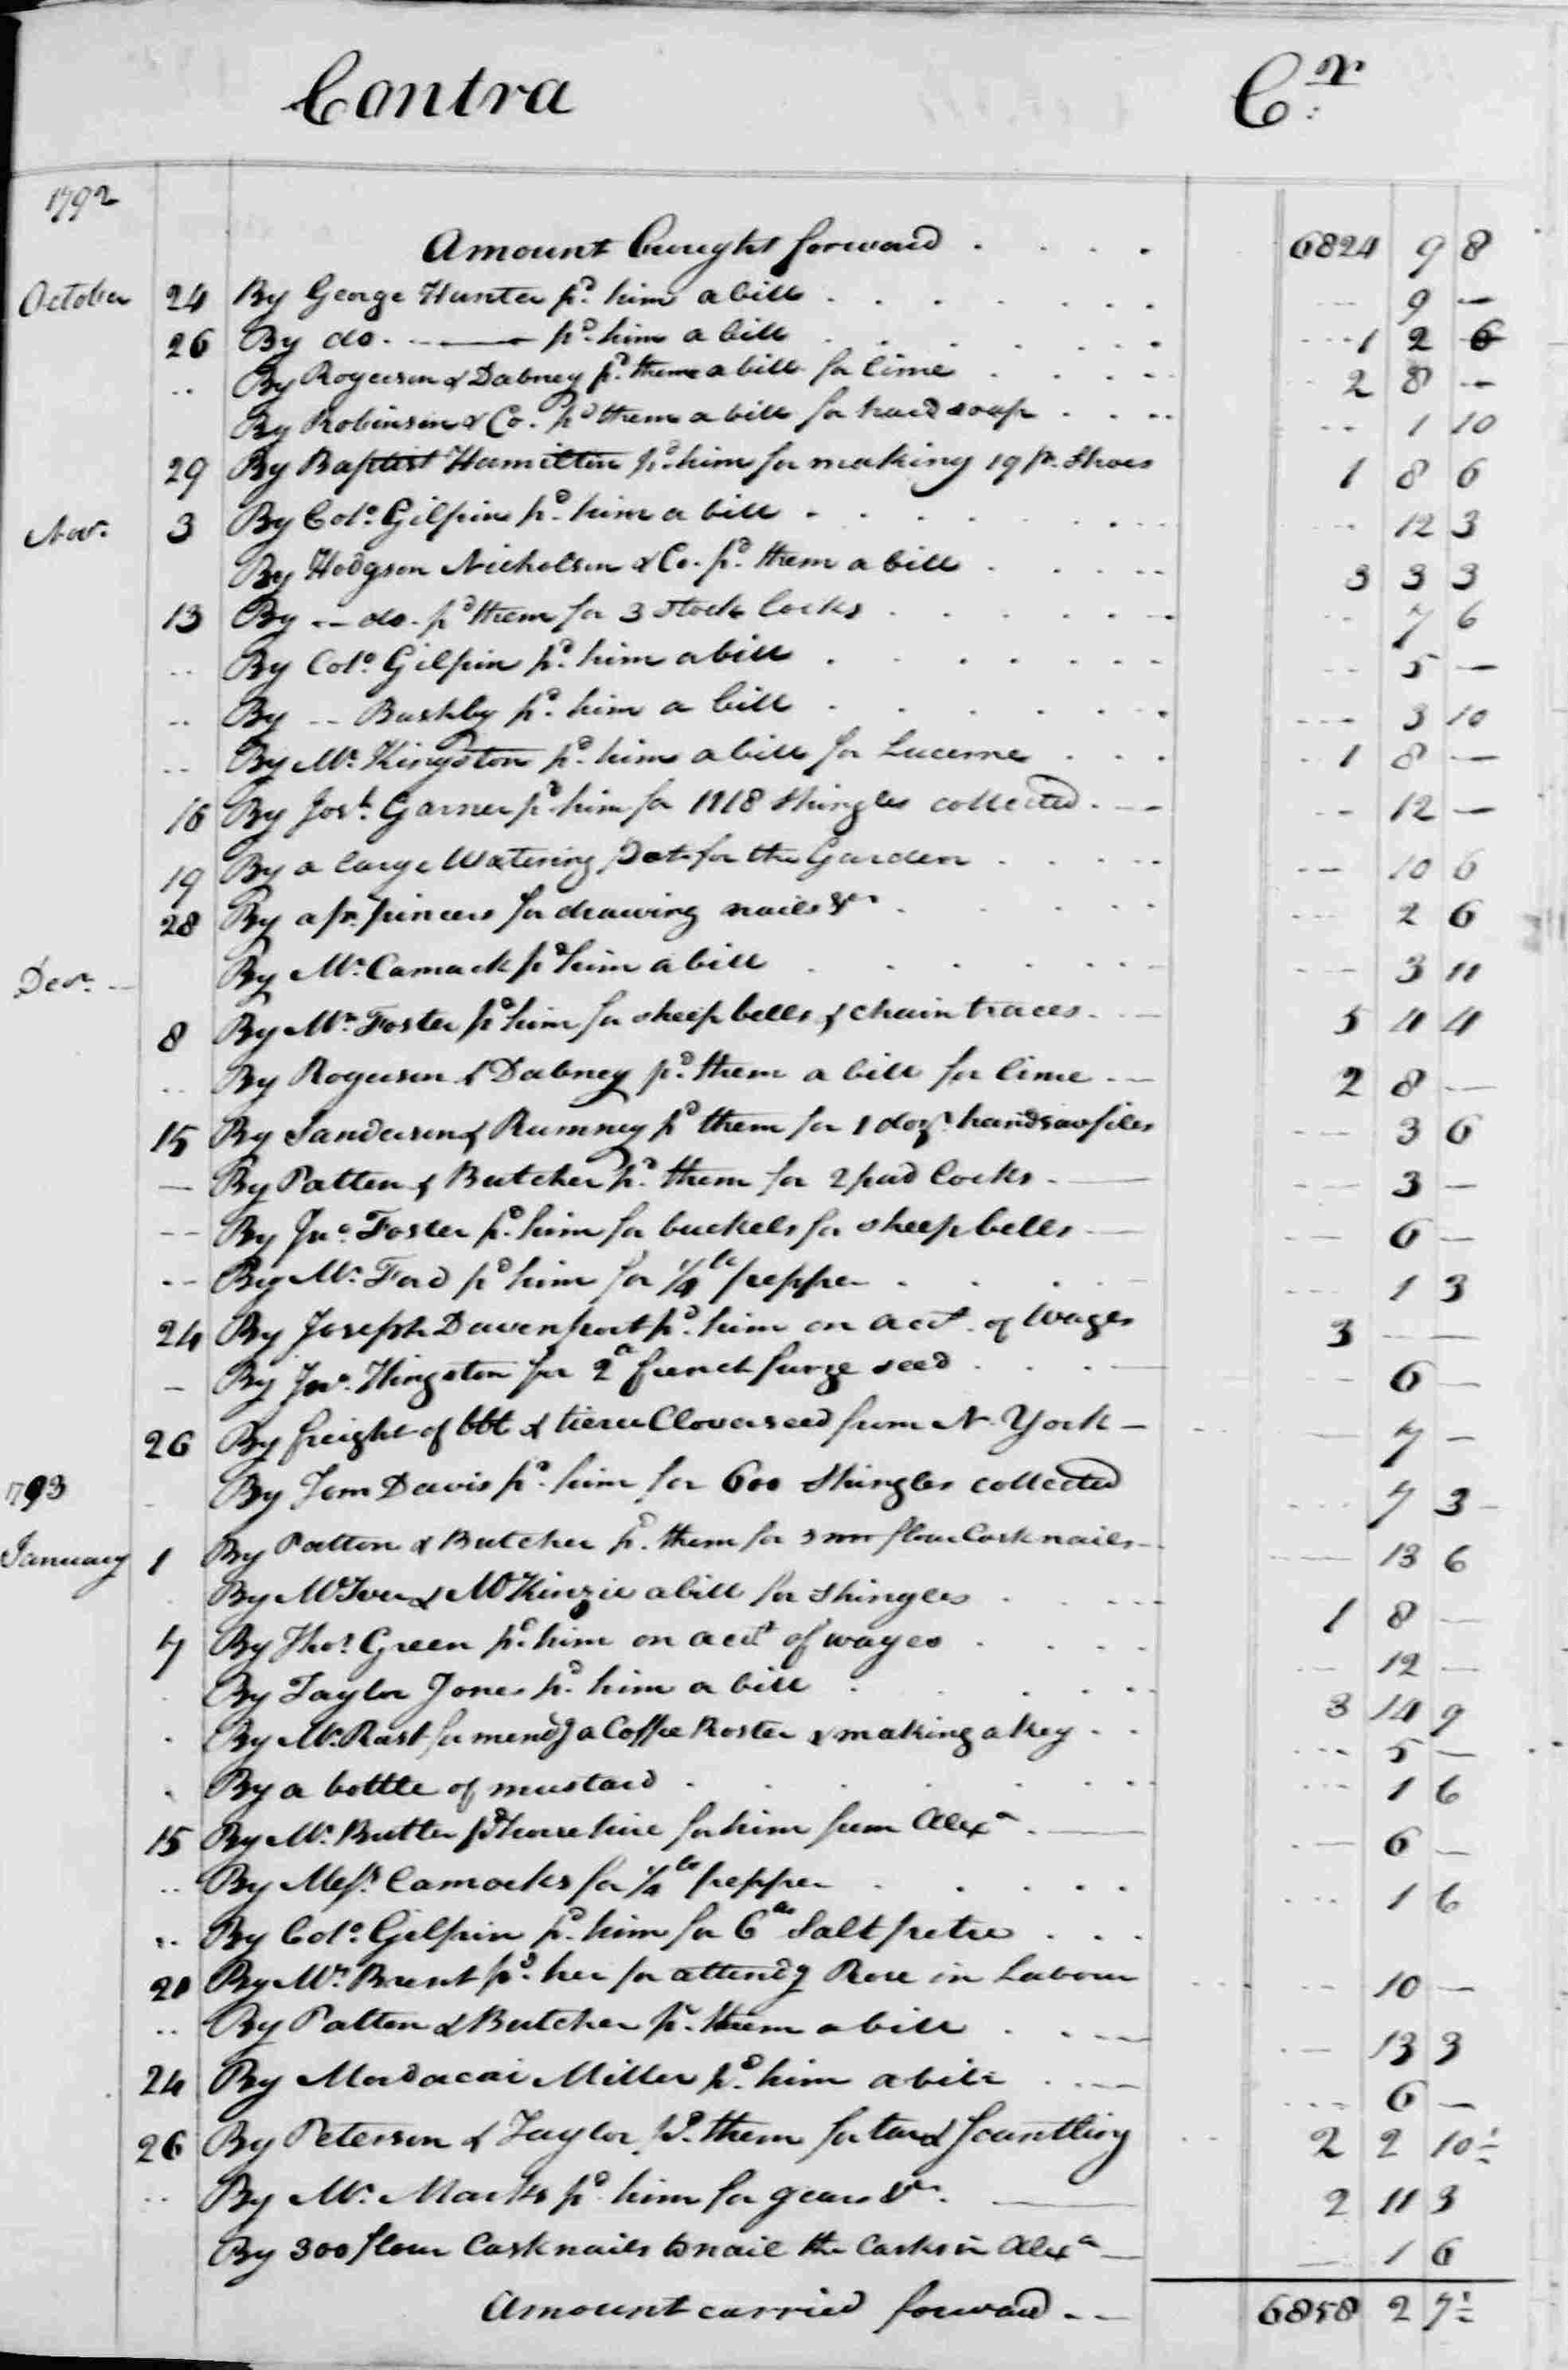 Ledger B, folio 348, right side